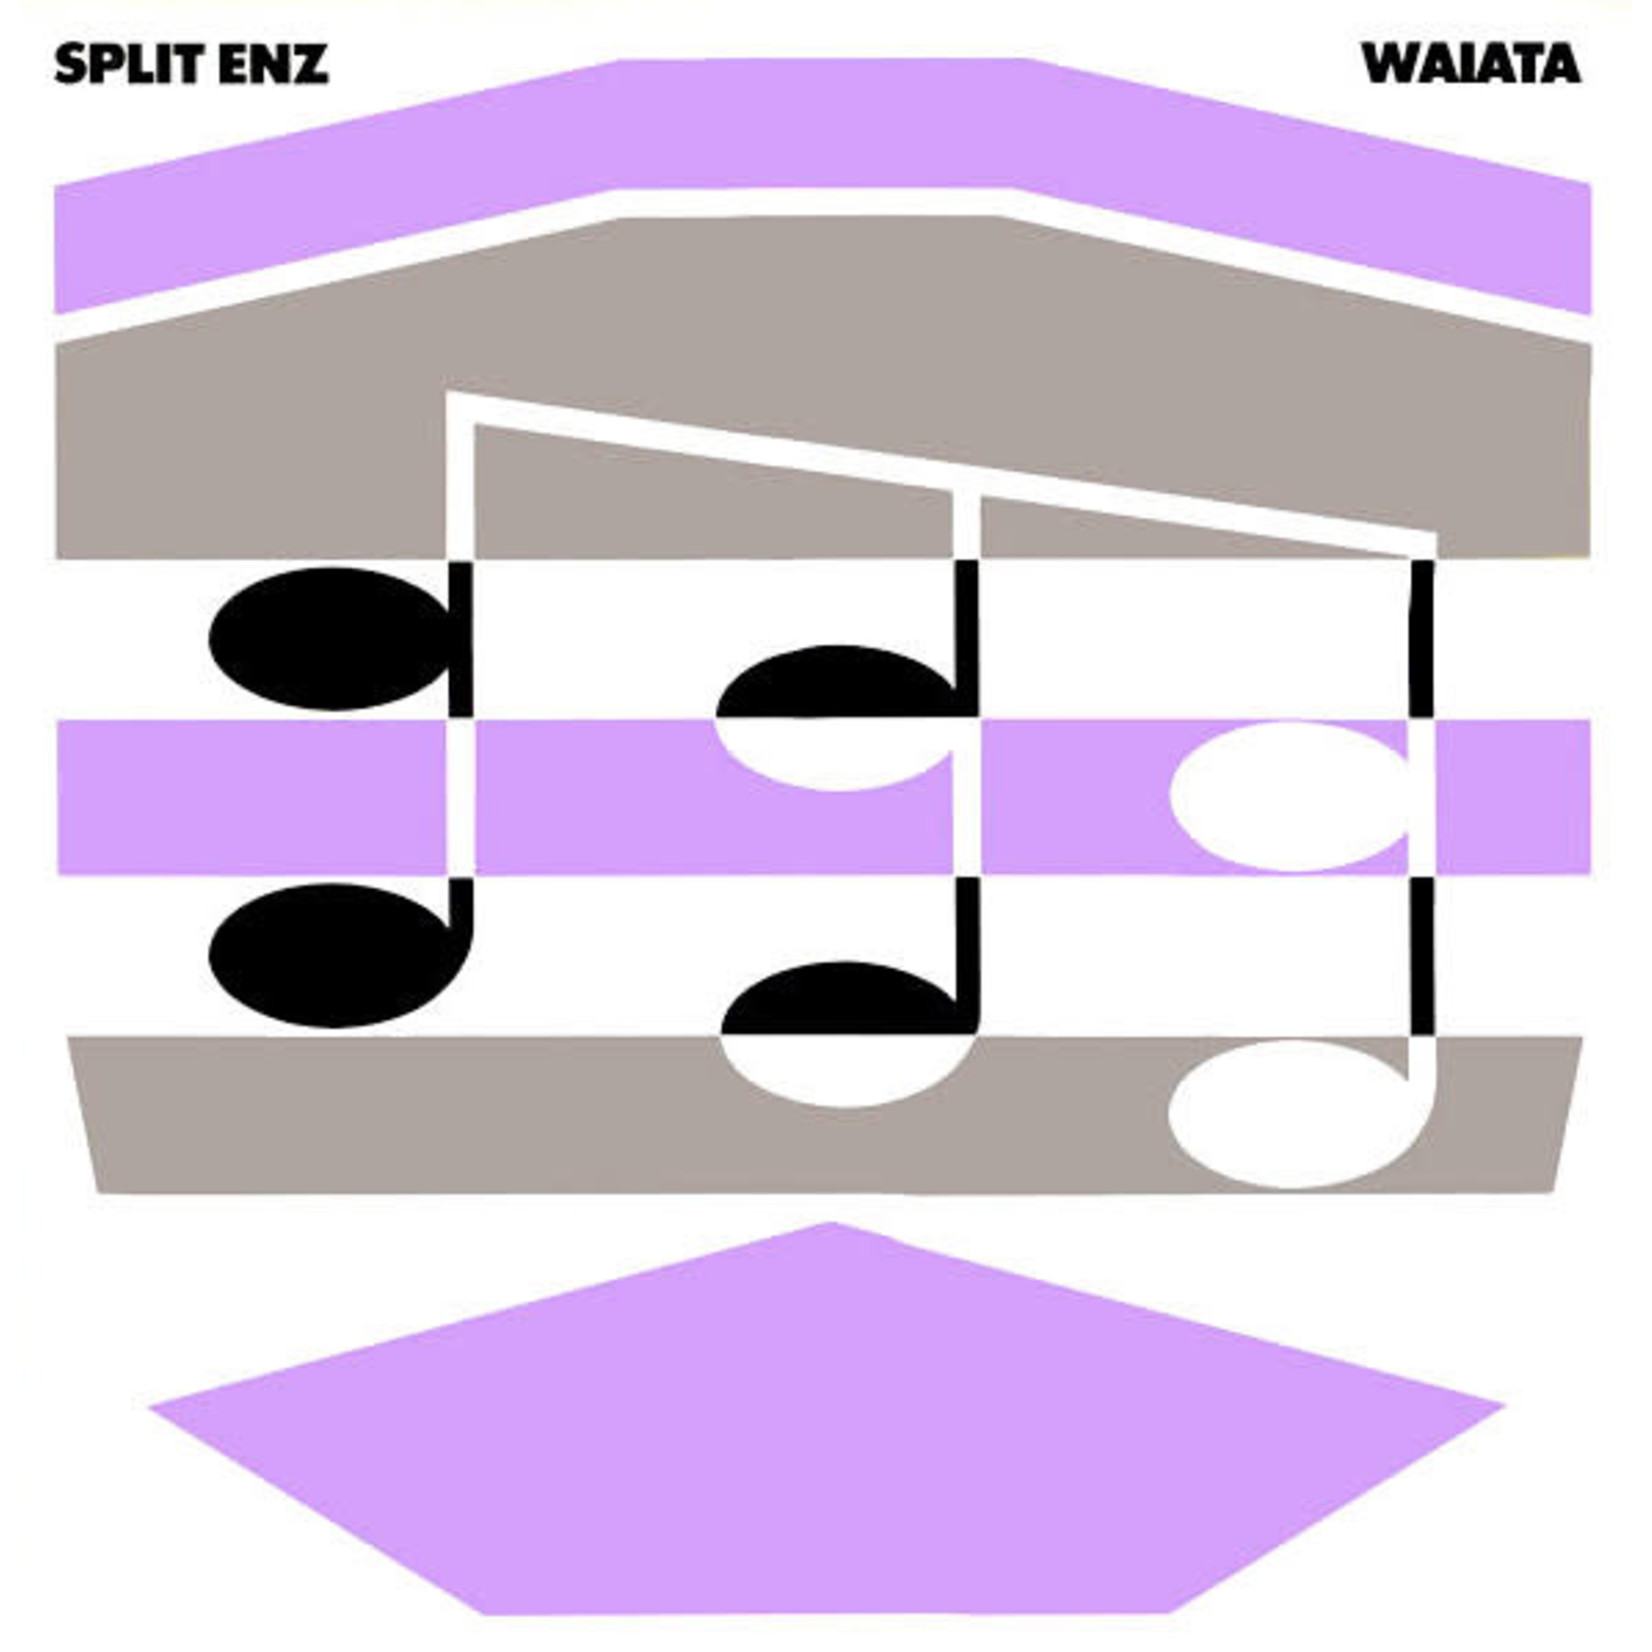 [Vintage] Split Enz: Waiata